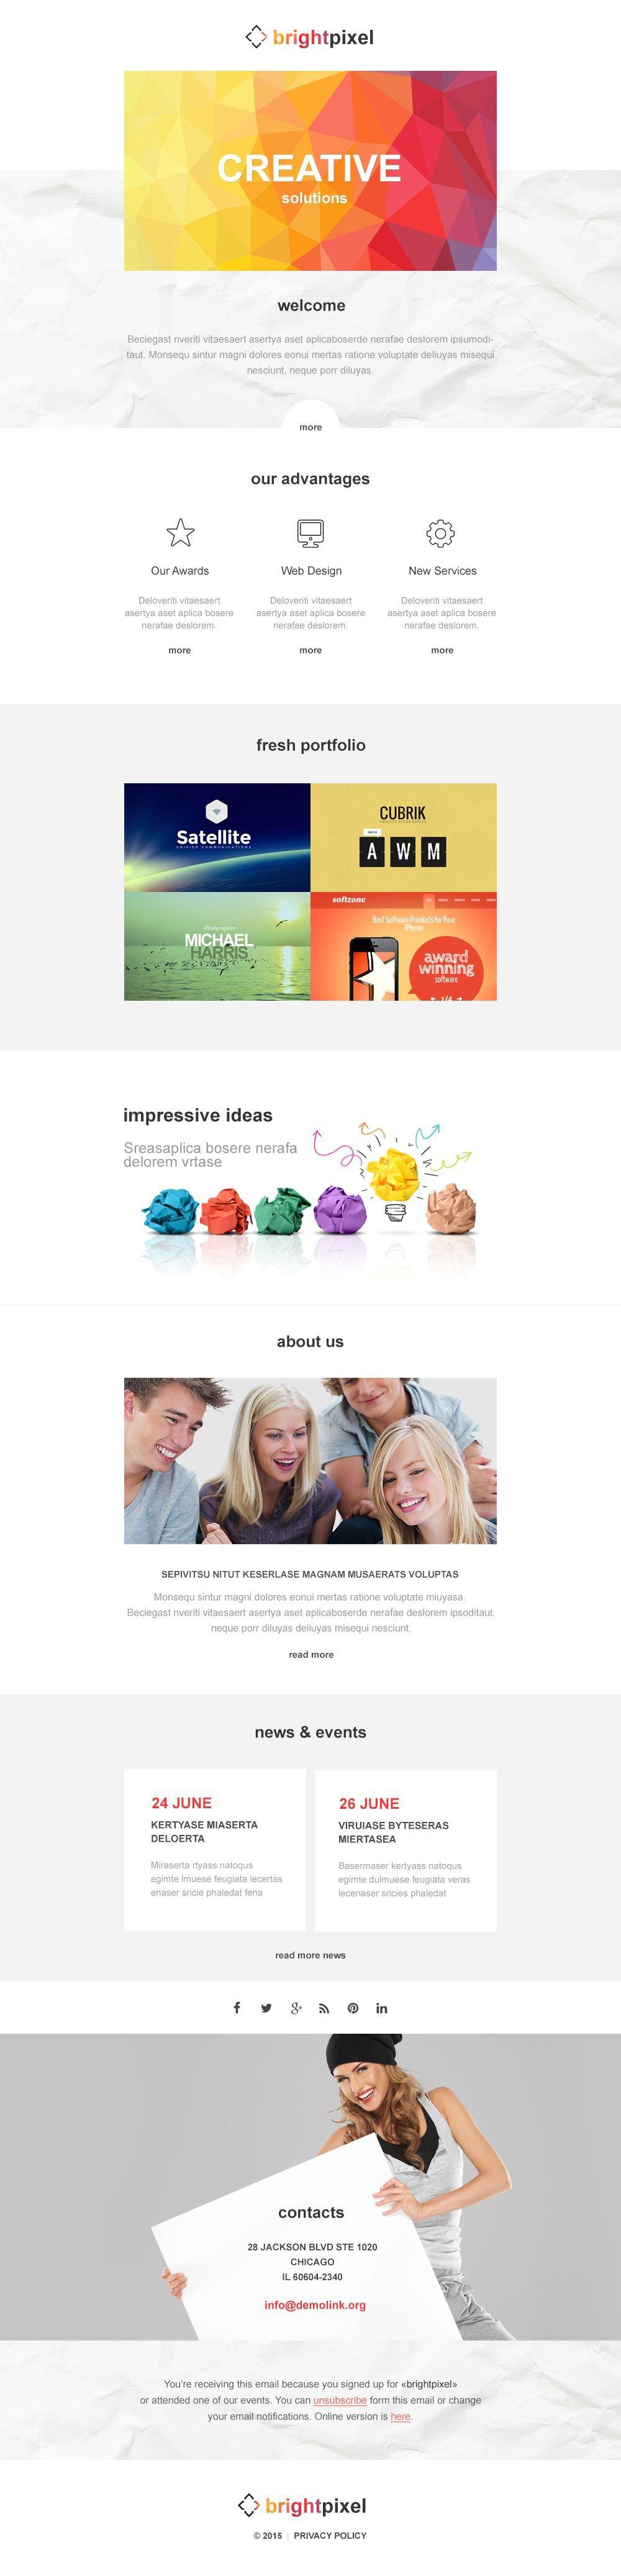 Plantilla De Boletín De Noticias Responsive para Sitio de Estudios de diseño #54862 - captura de pantalla